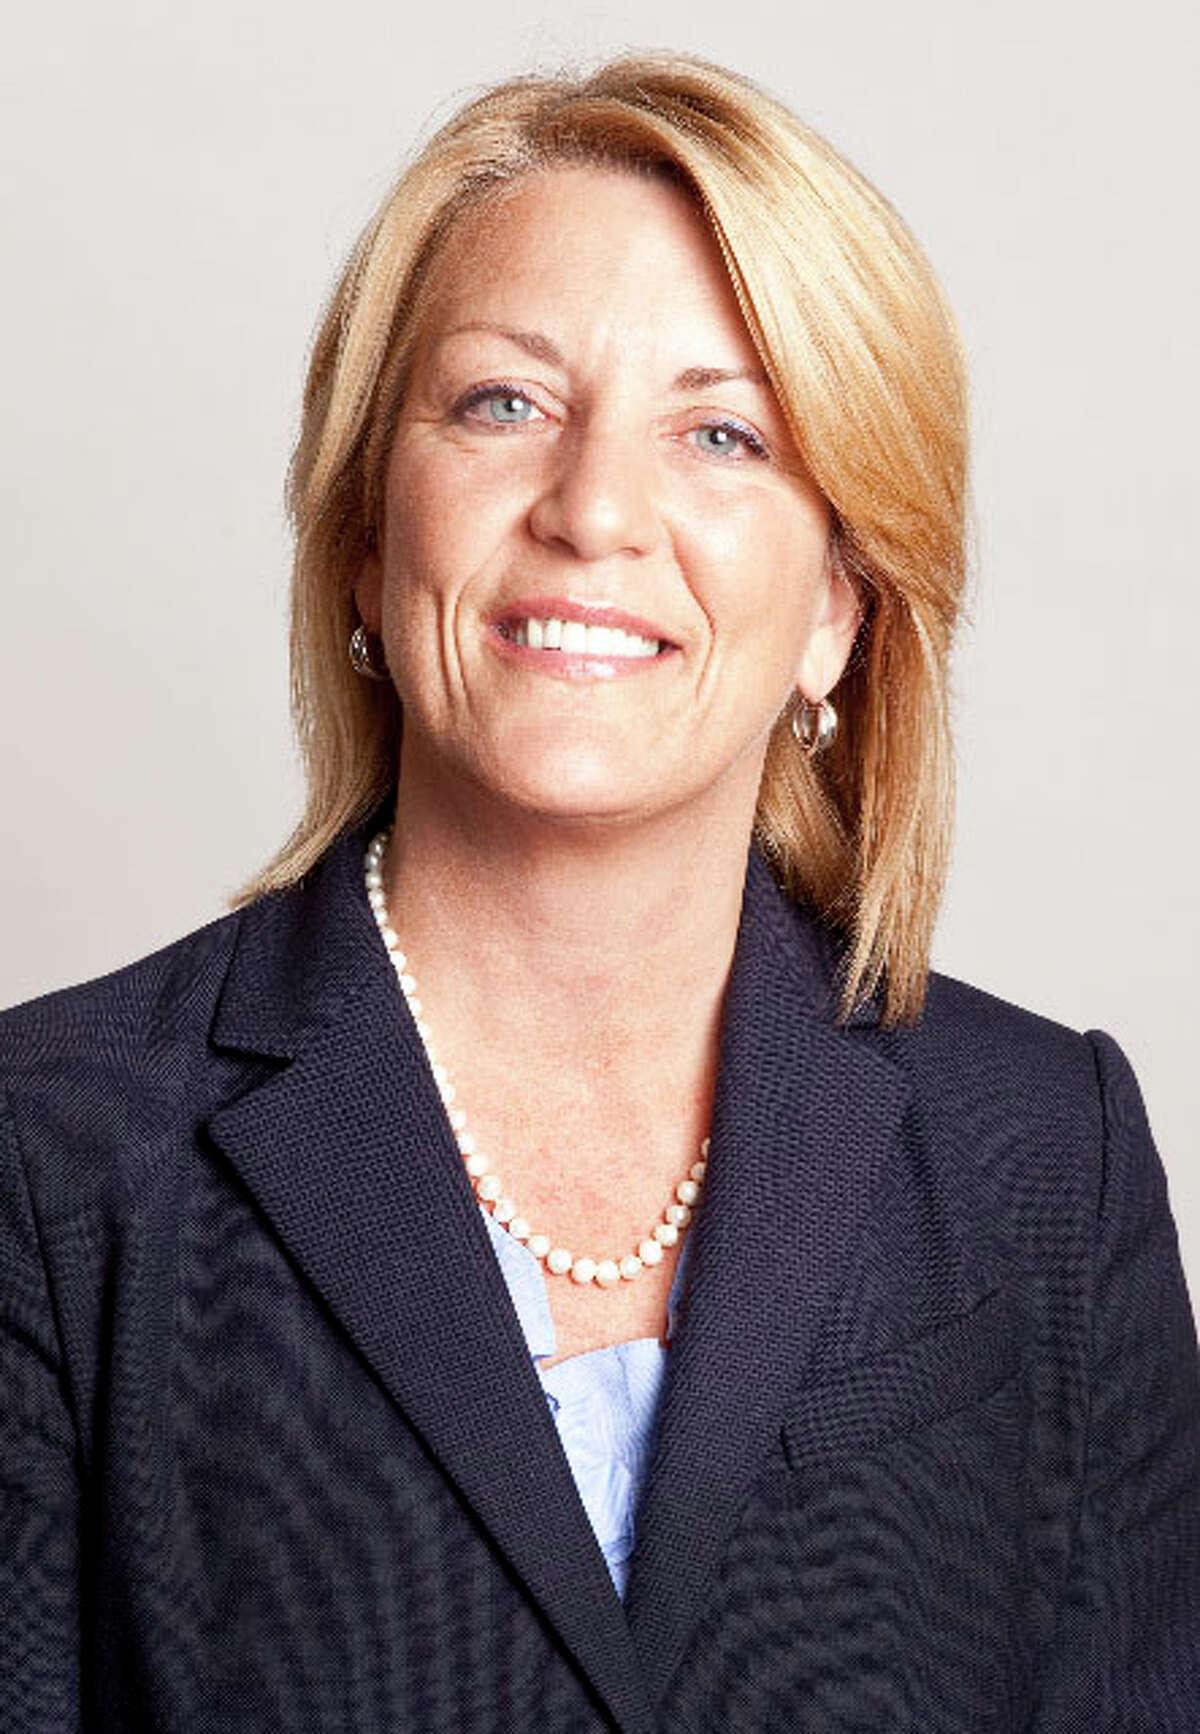 State Rep. Brenda Kupchick, R-132